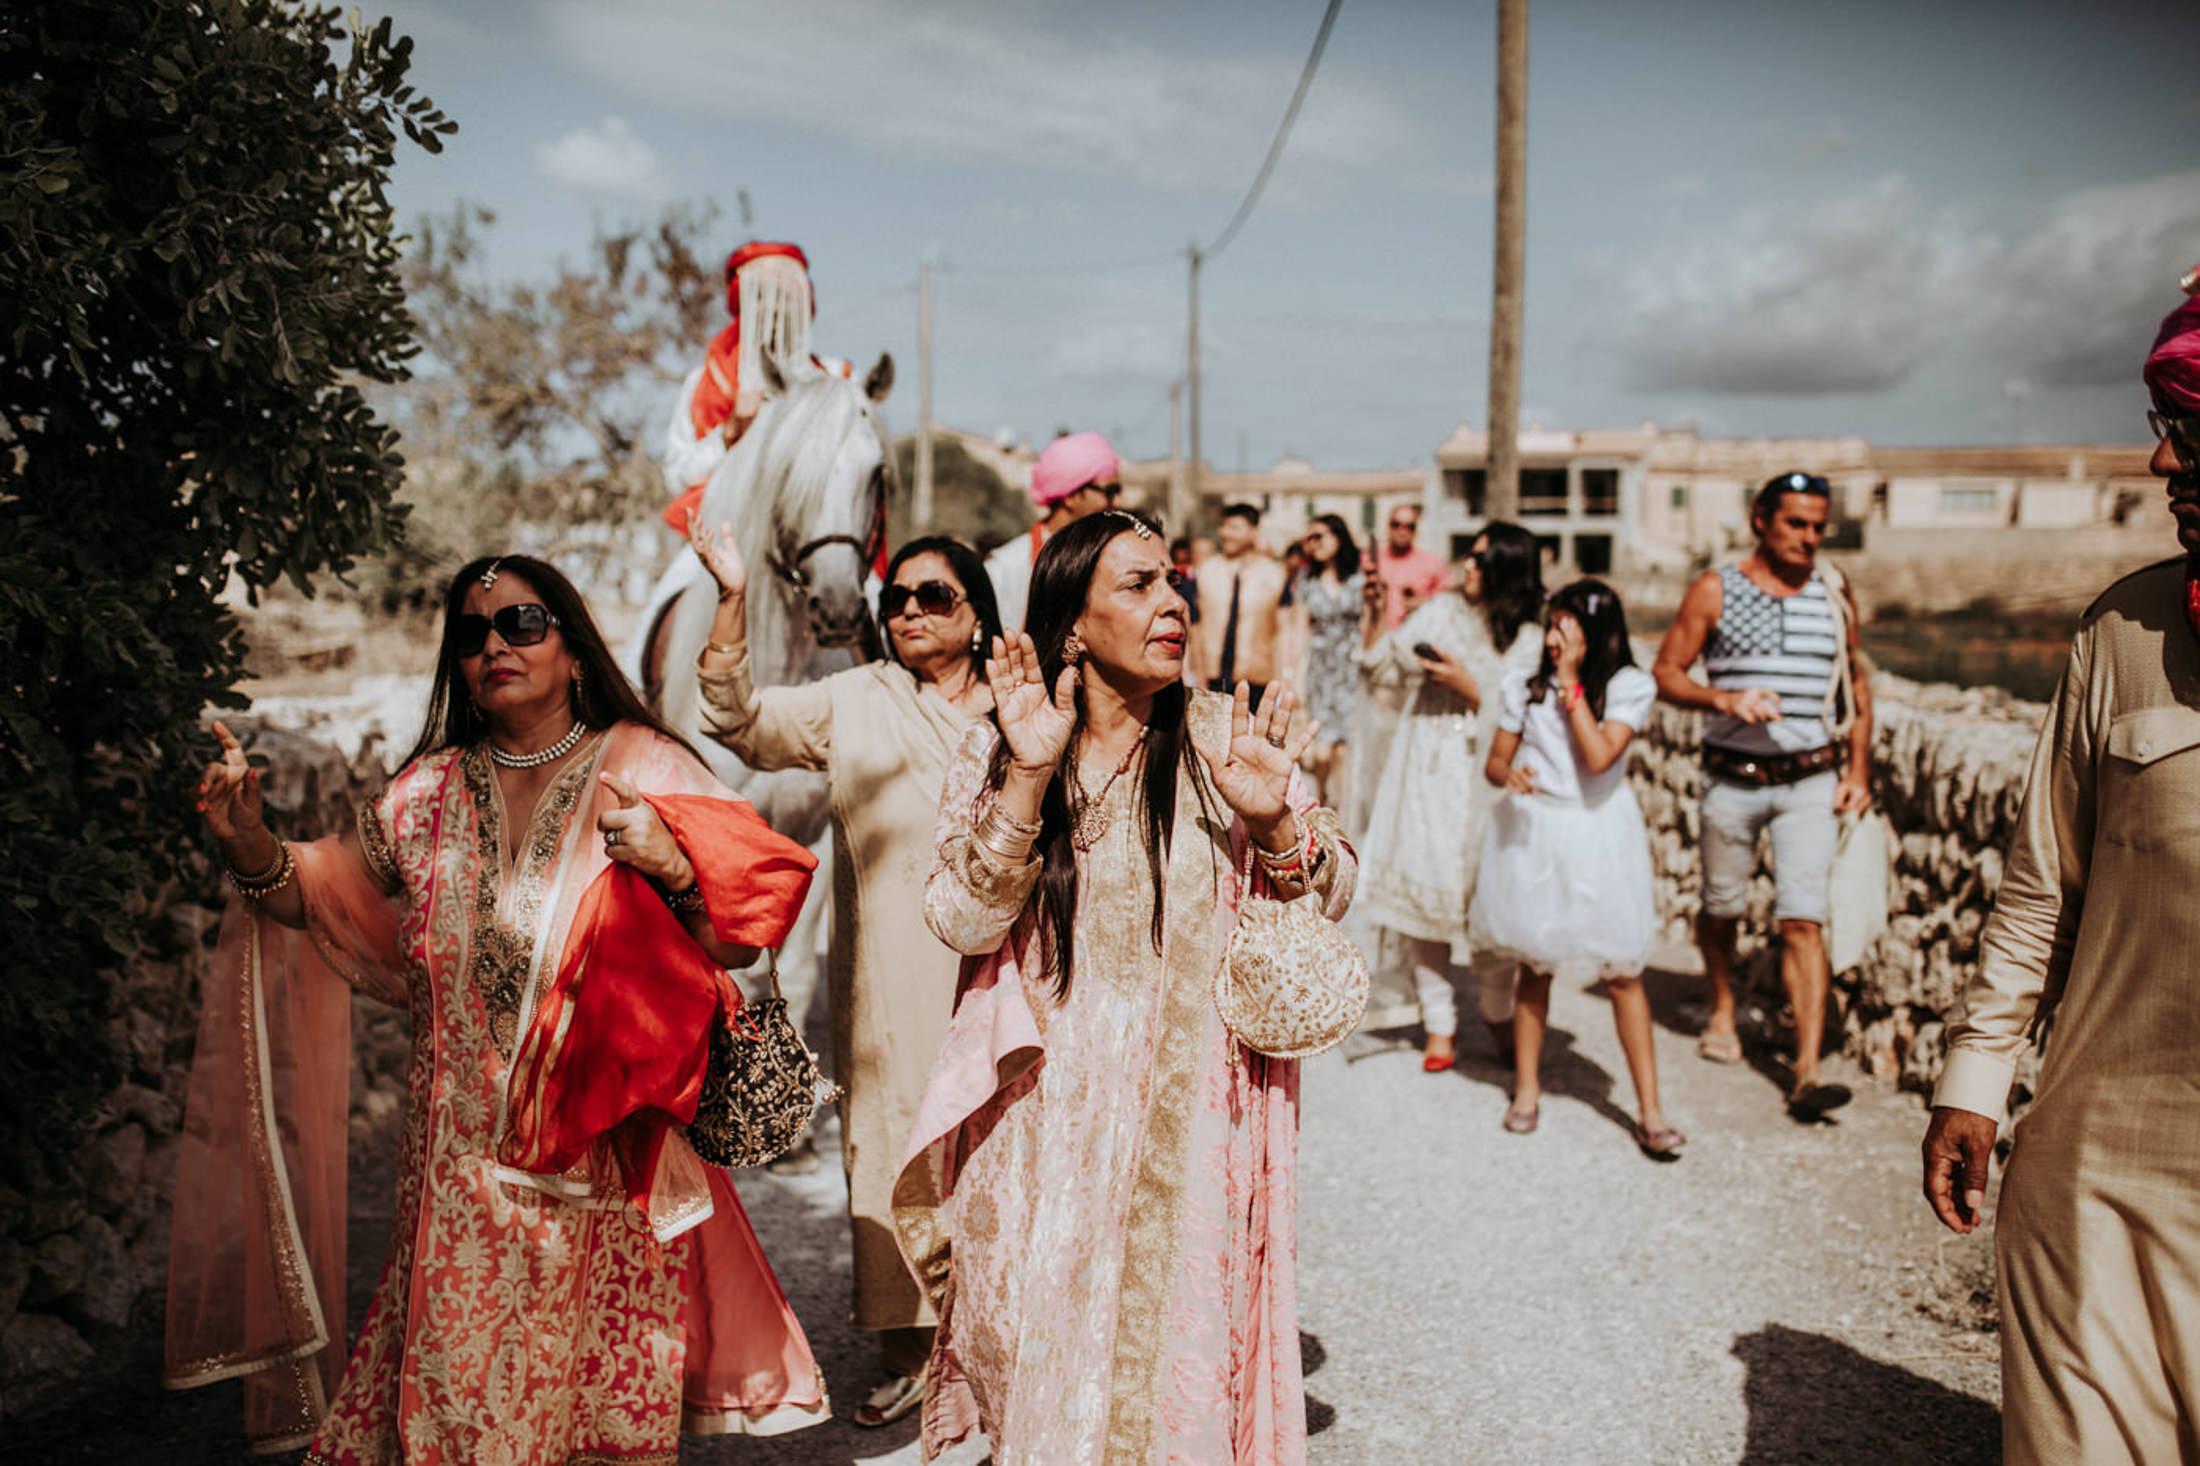 Wedding_Photographer_Mallorca_Daniela-Marquardt_Photography_New_York_Iceland_Tuscany_Santorini_Portugal_Austria_Bavaria_Elopement_Hochzeitsfotograf_AntjeRajat2_29